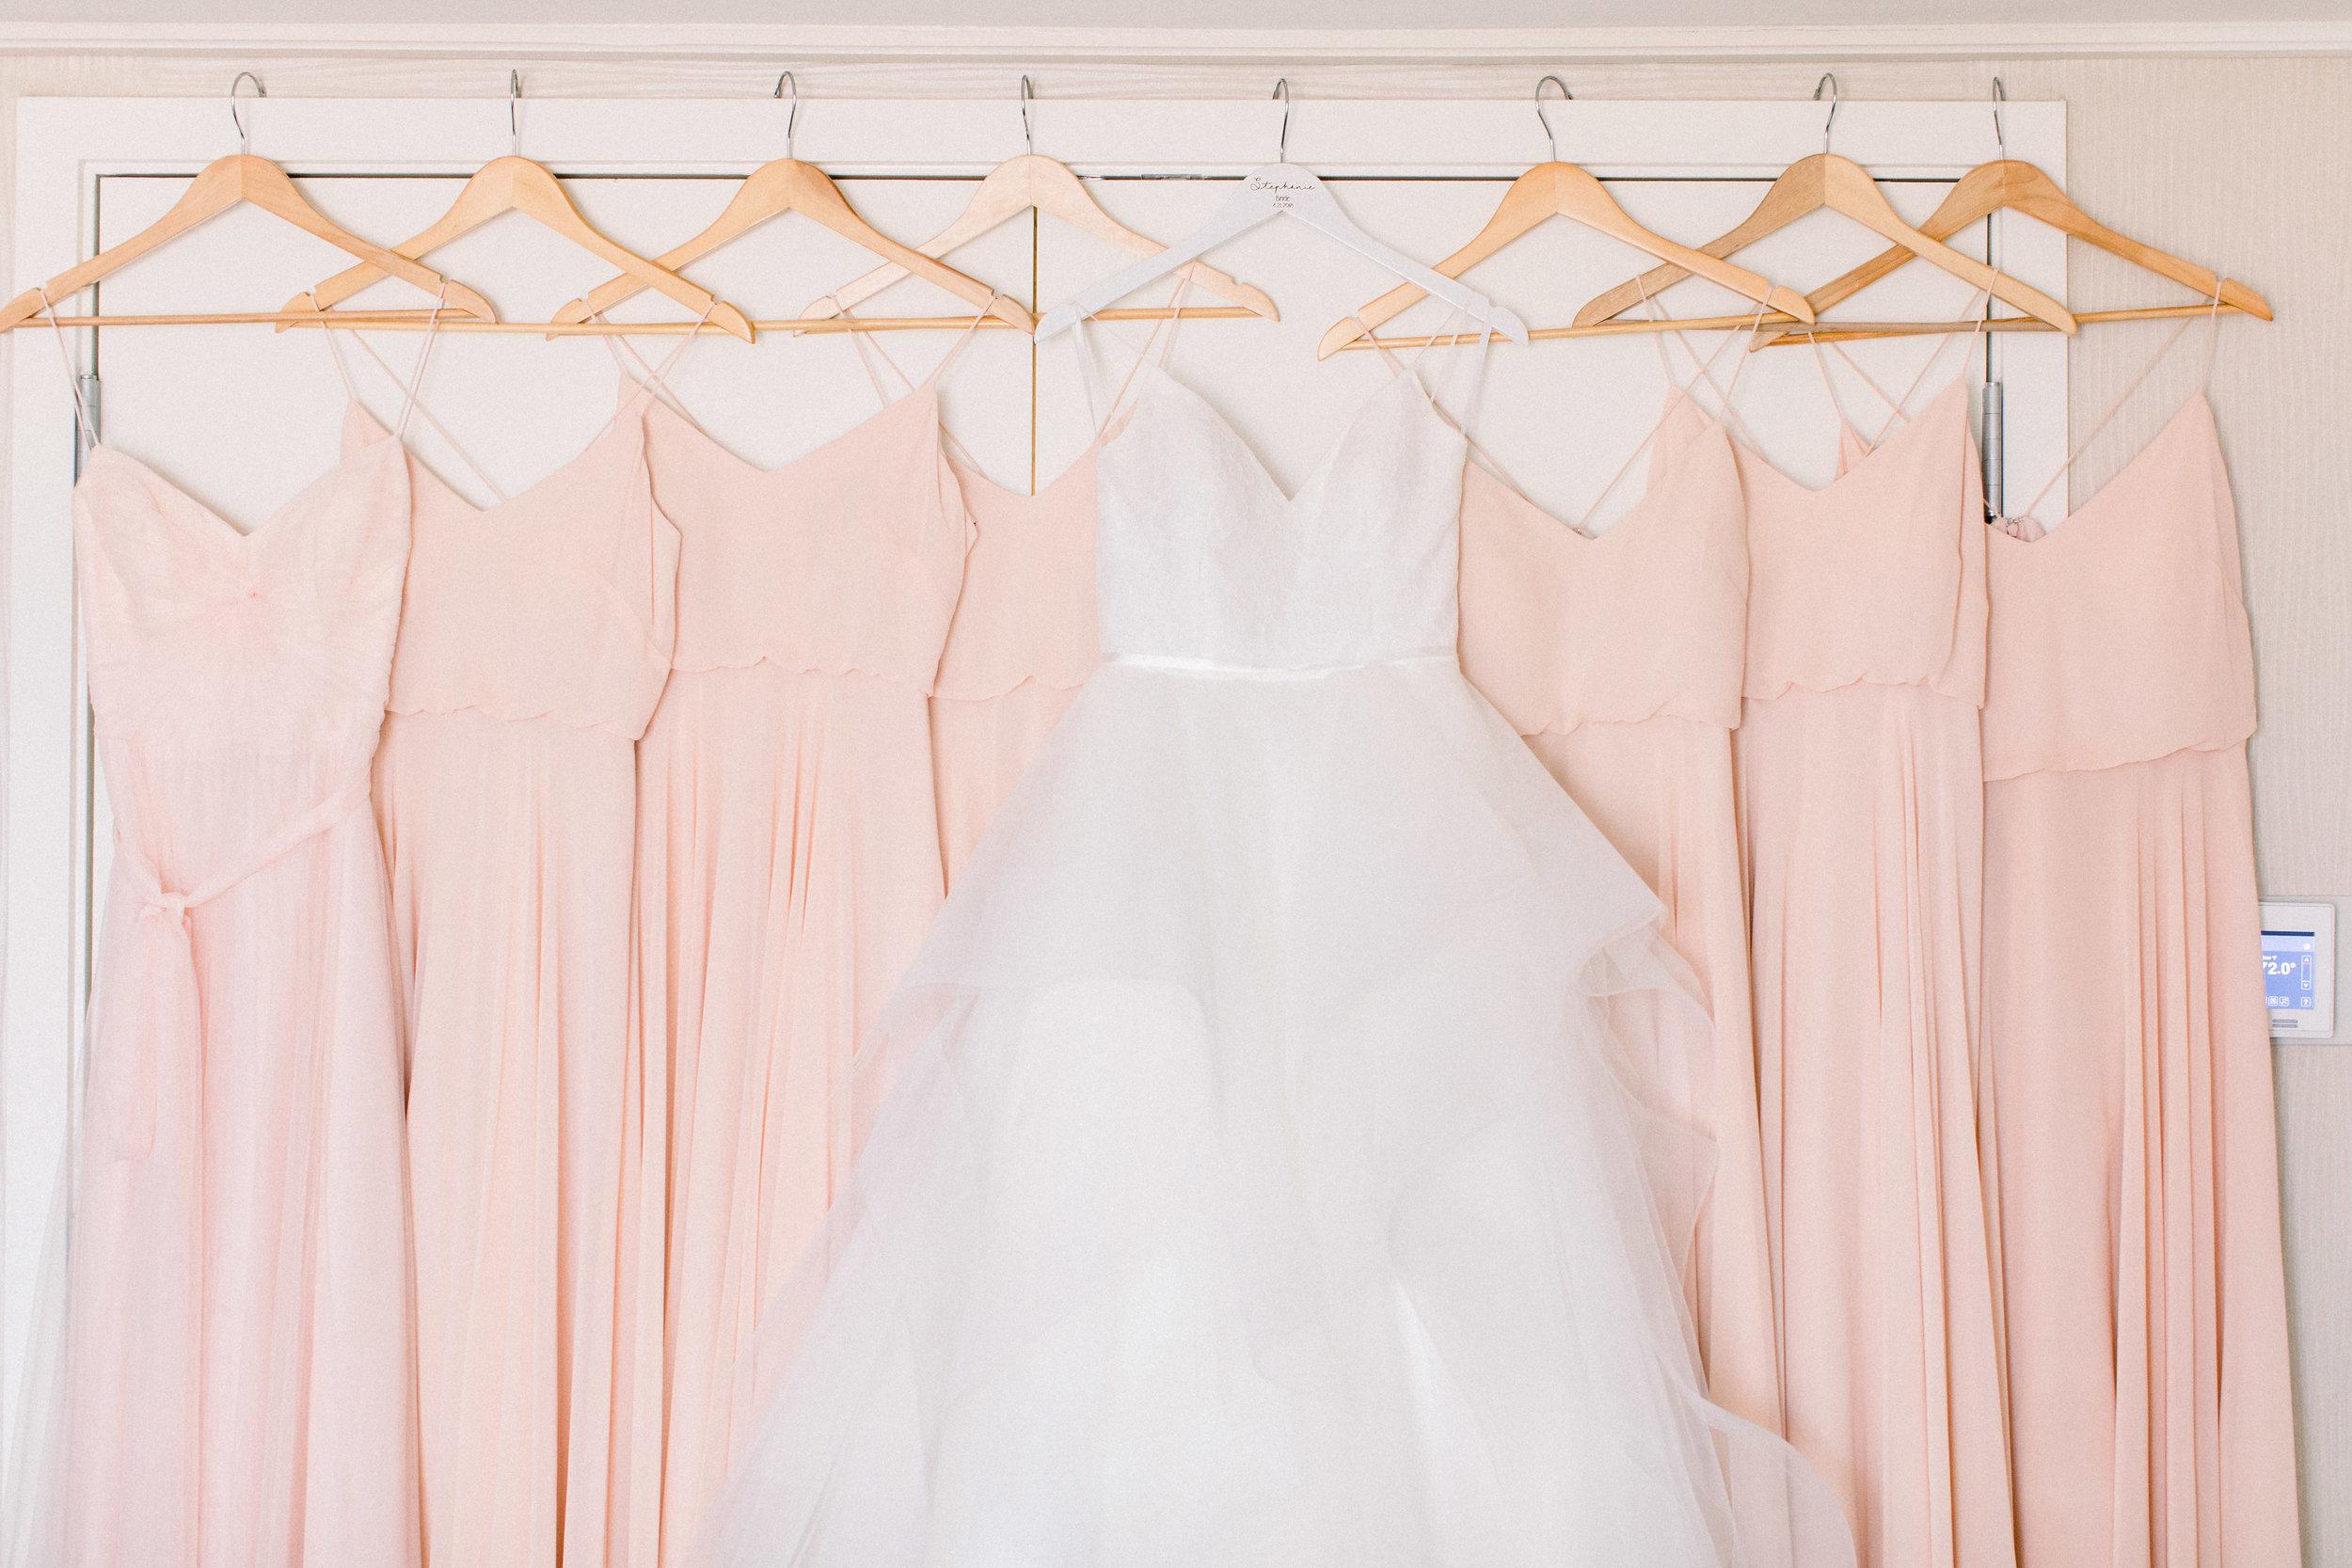 www.santabarbarawedding.com | Jenny Quicksall | Santa Barbara Club | Bluebell Events | Bridesmaid Dresses and Wedding Gown